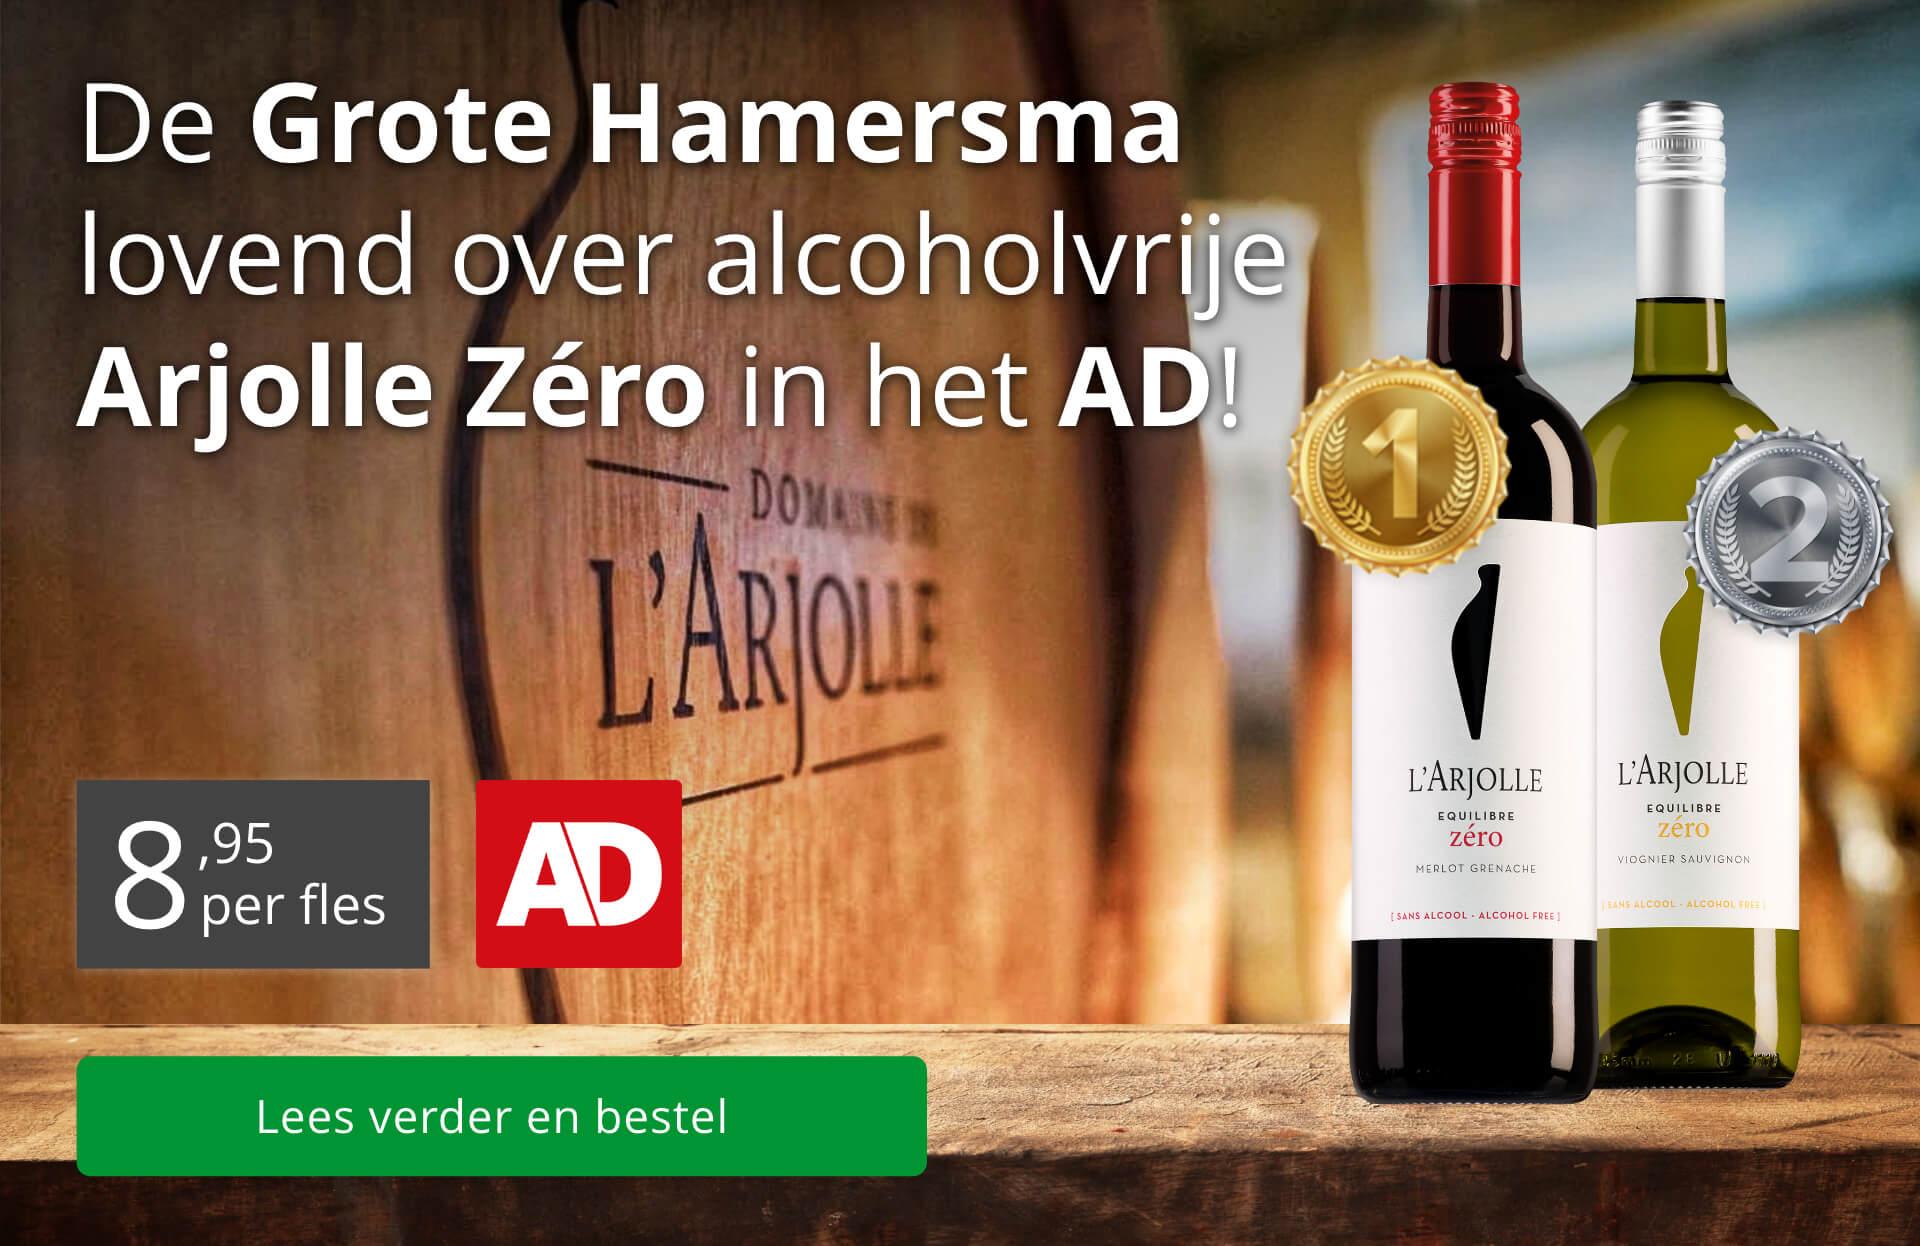 AD vermelding - Arjolle Zéro-wijnen